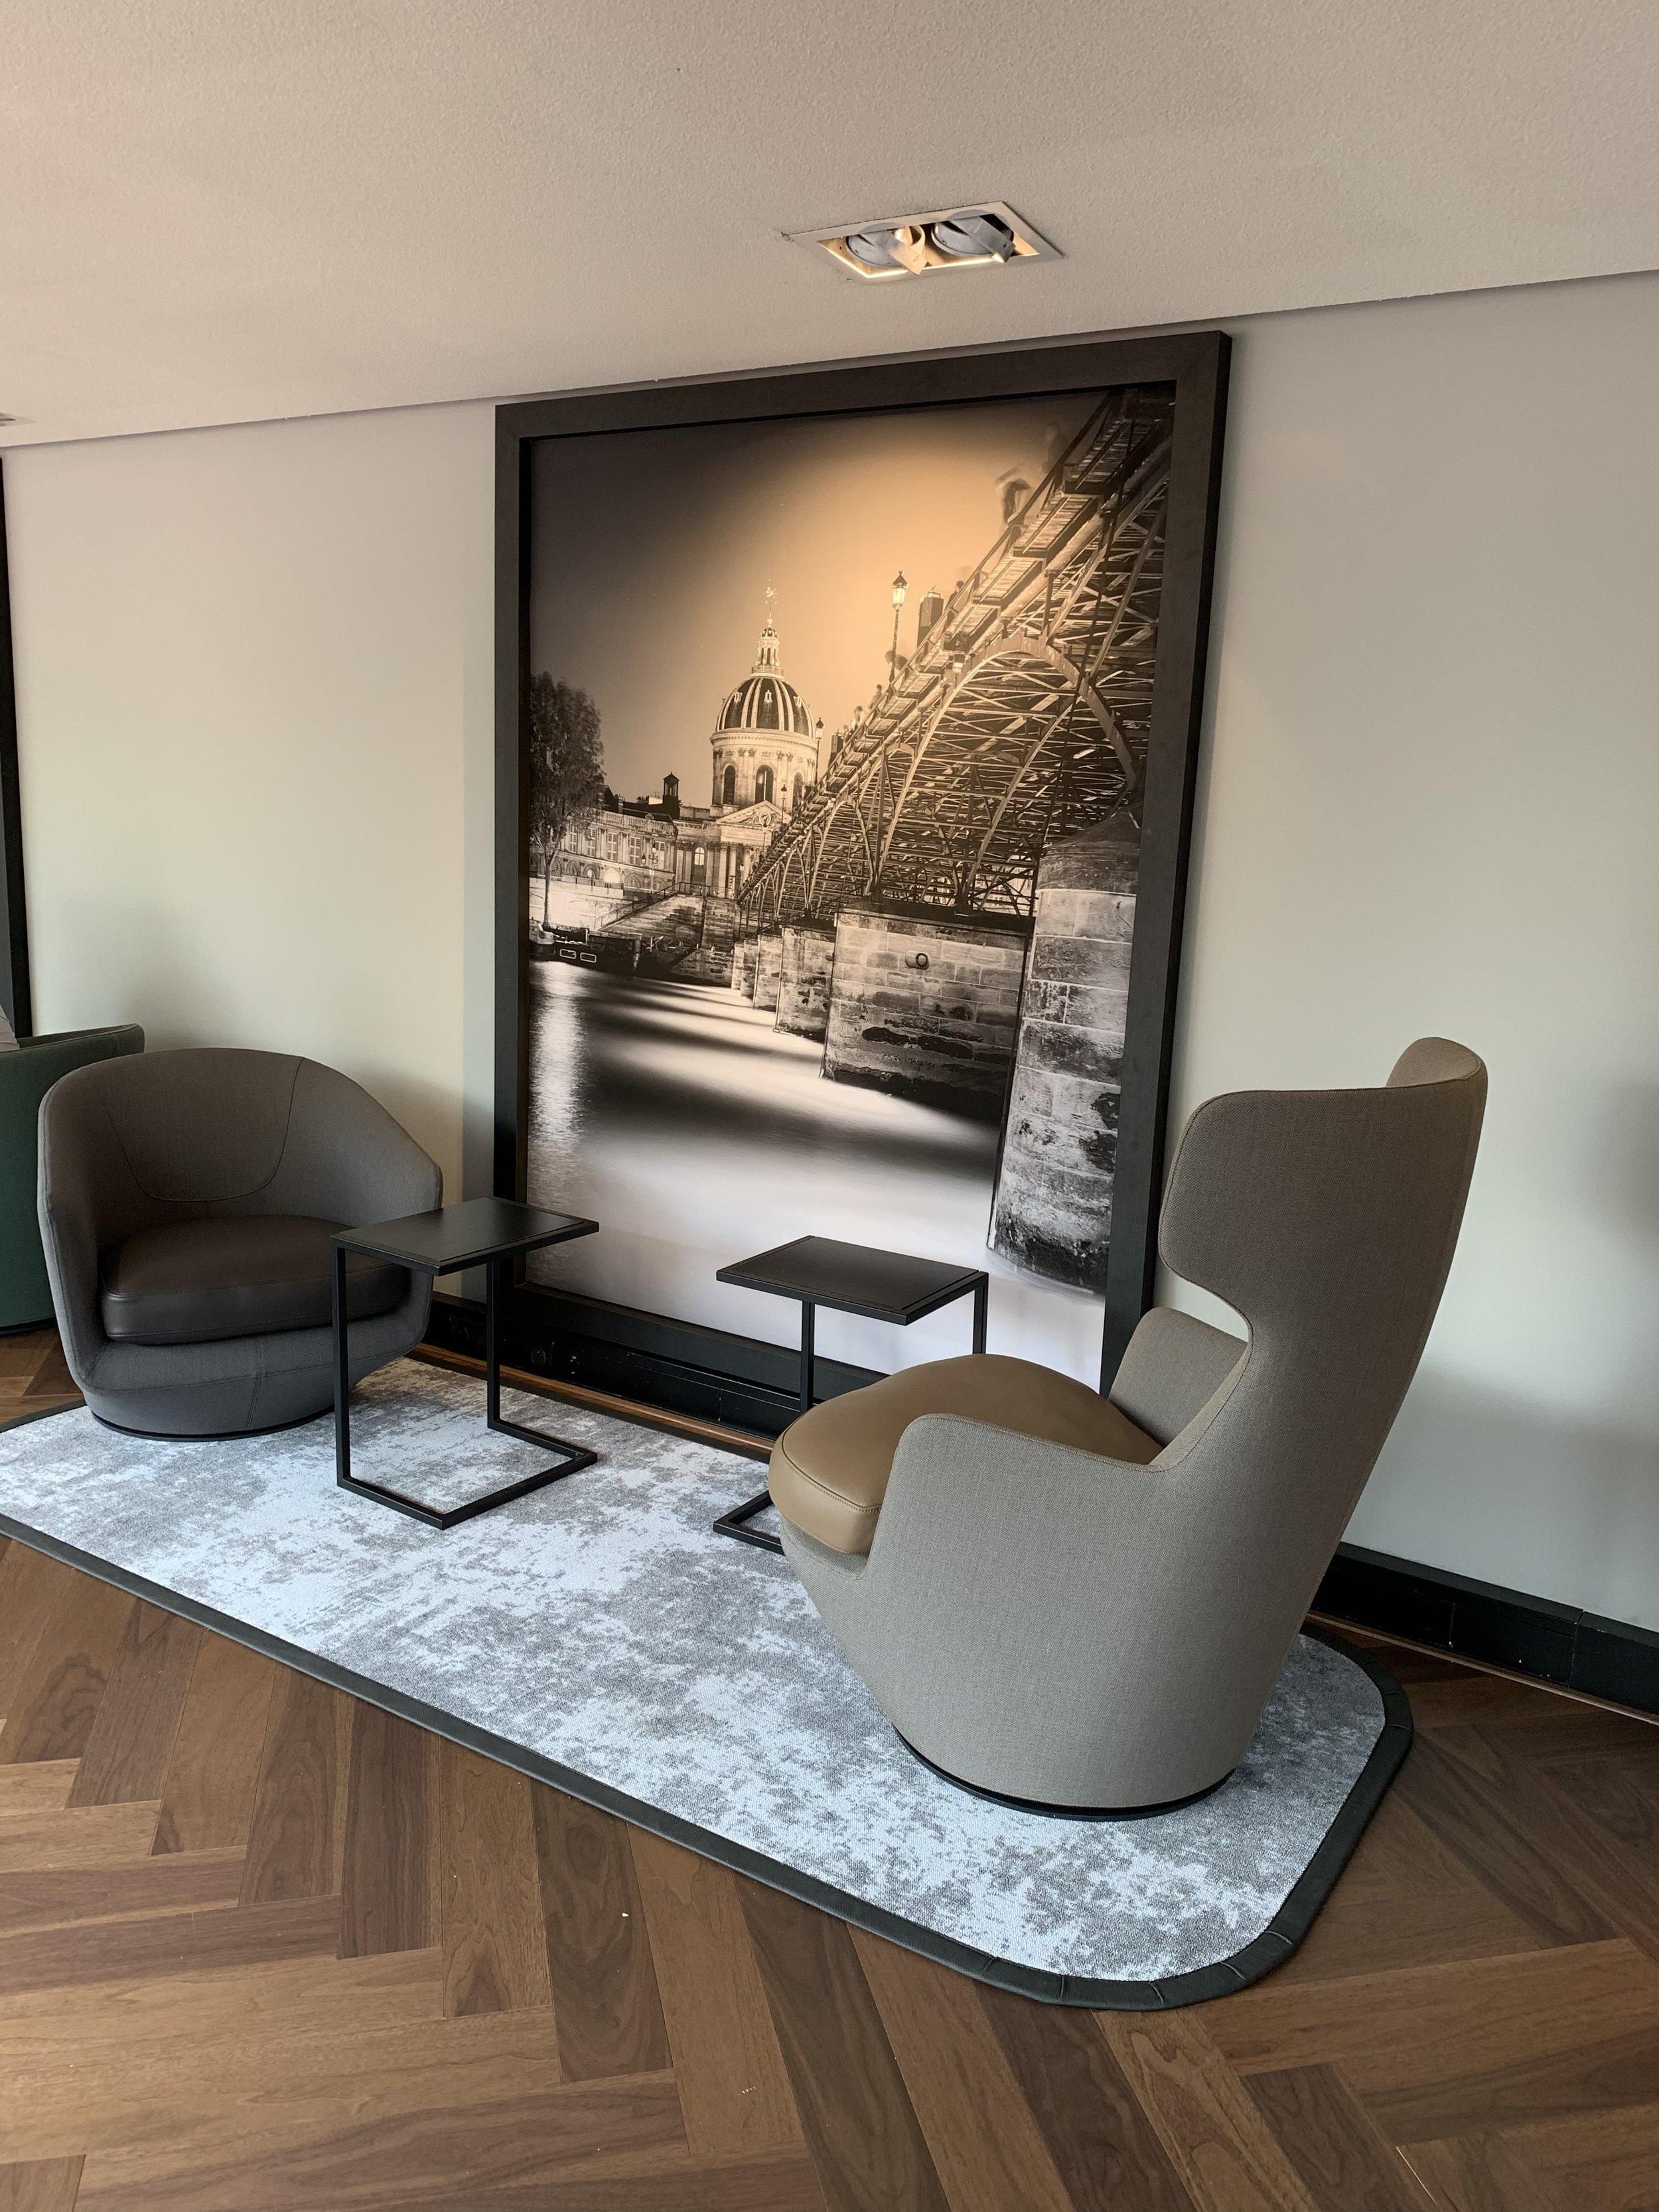 New Refurbished Star Alliance Lounge Paris Charles De Gaulle 7.jpeg